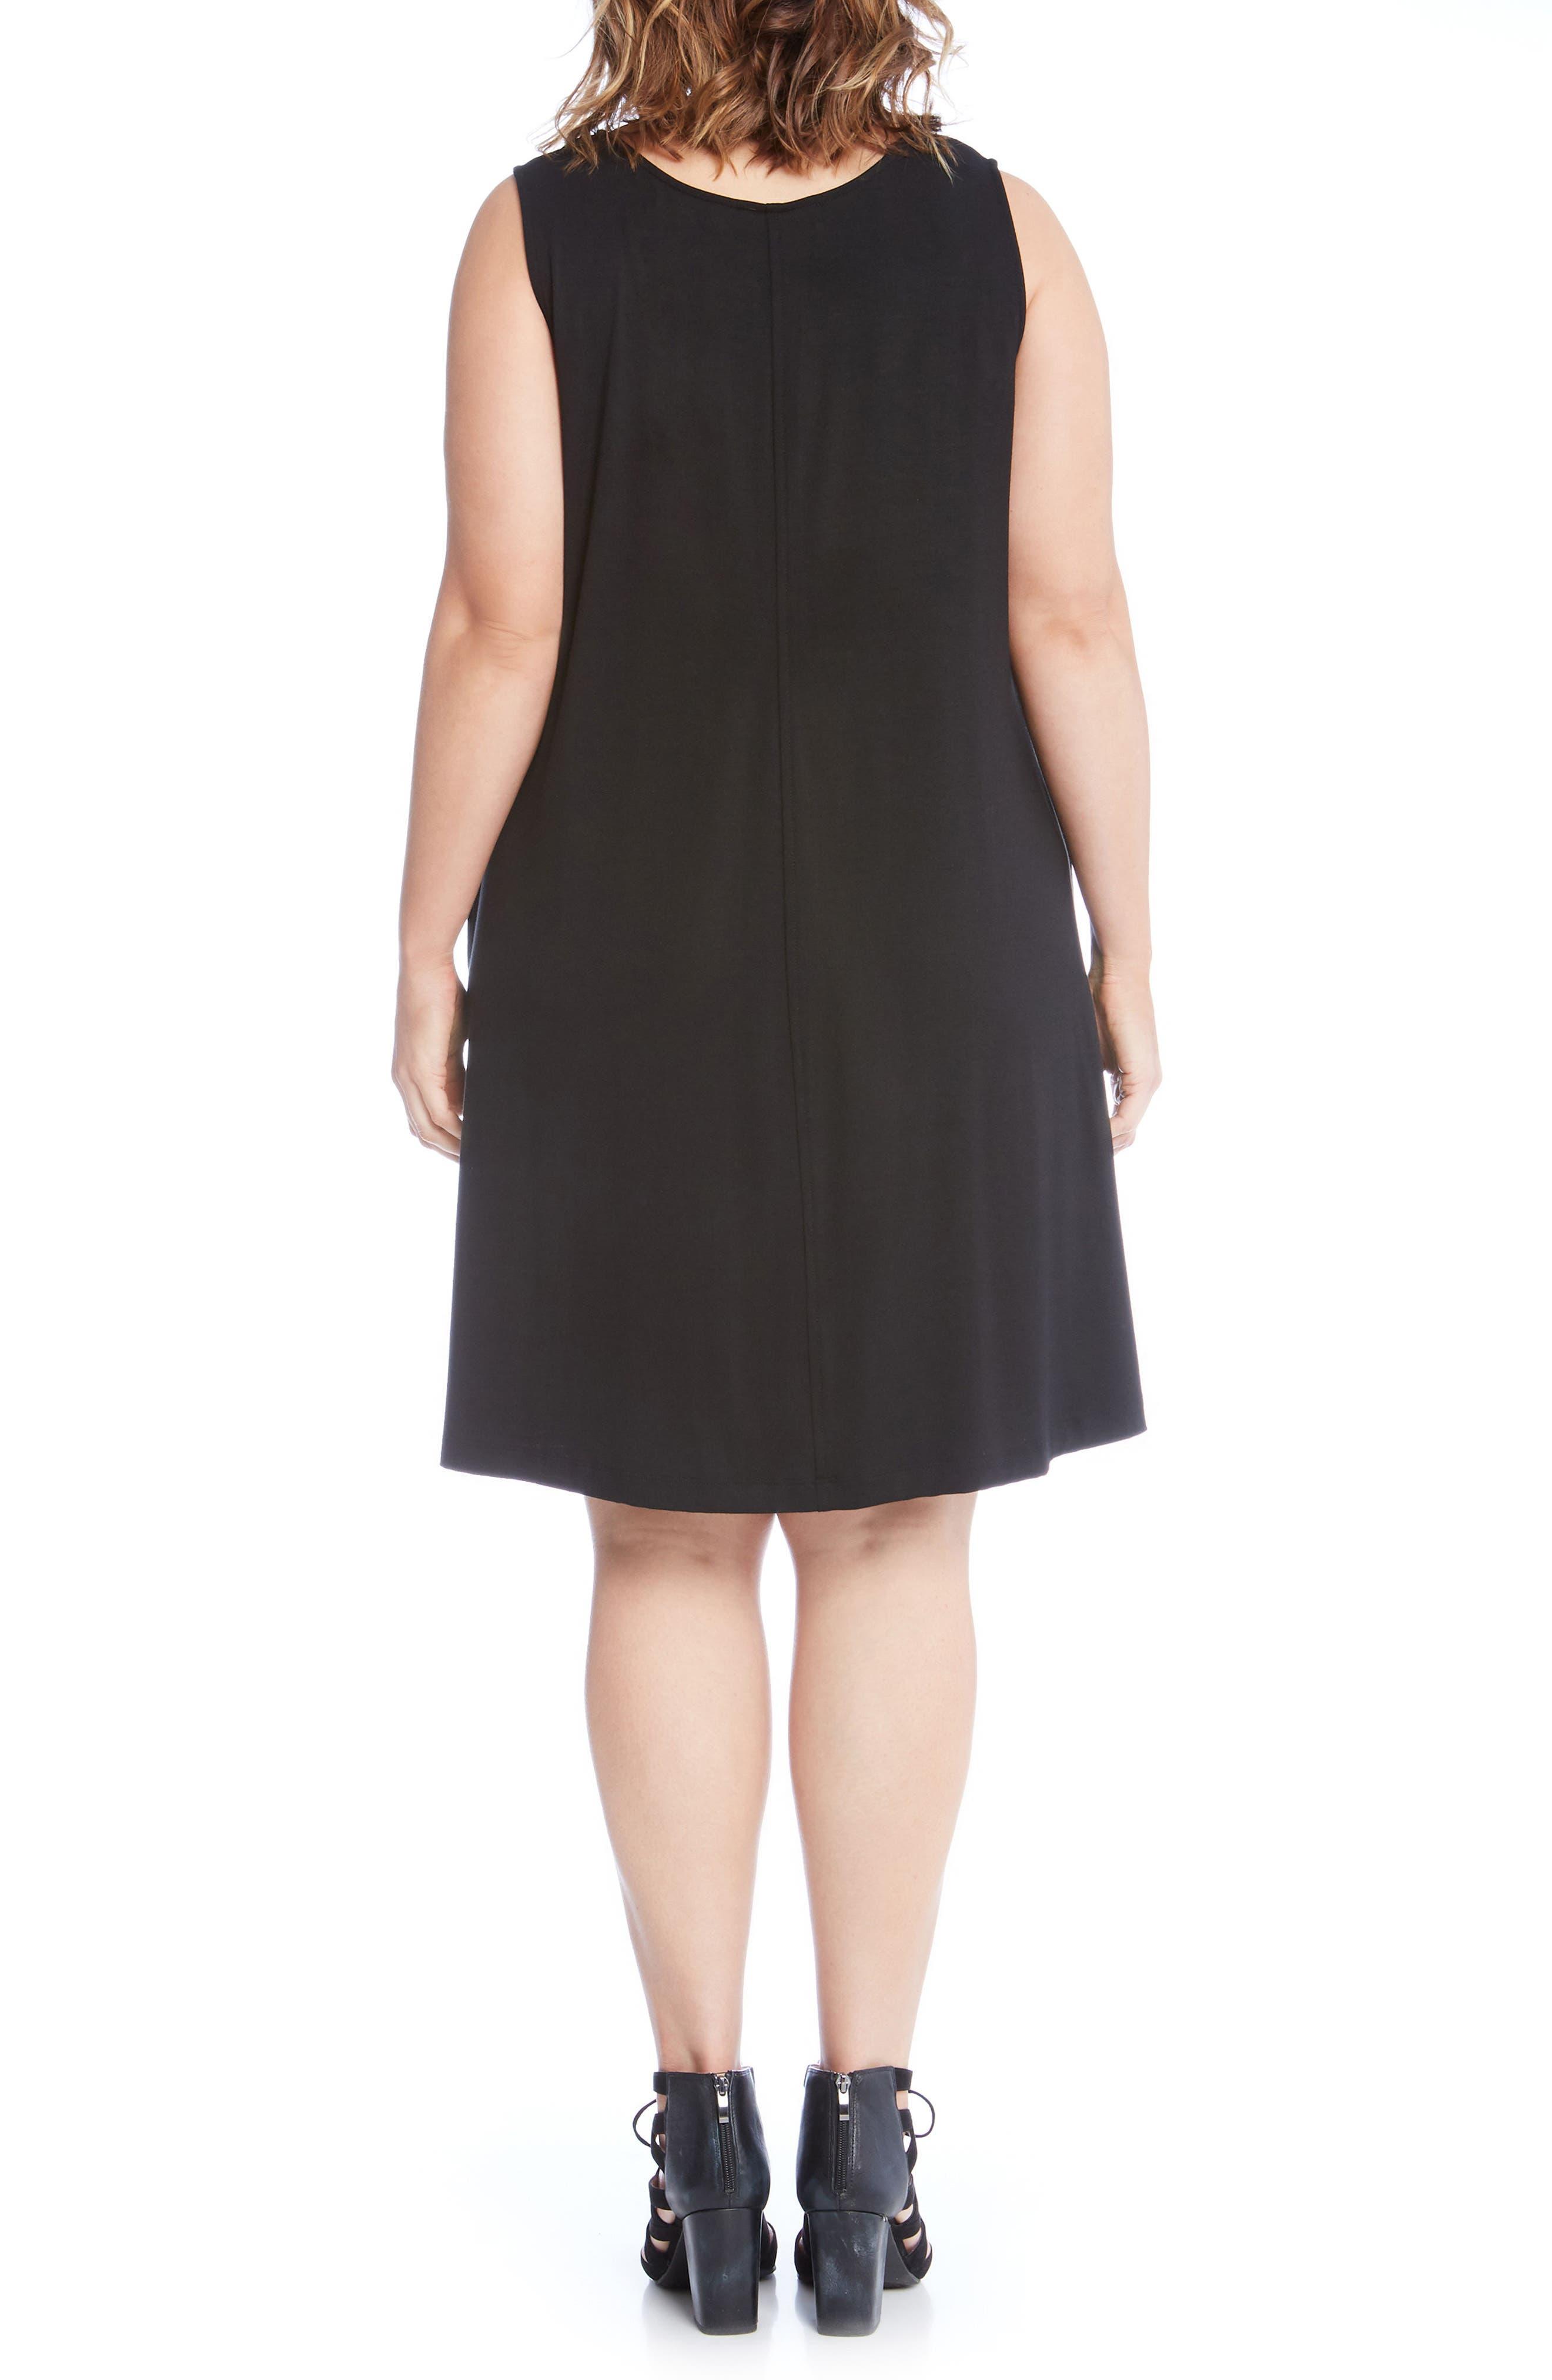 Chloe Swing Dress,                             Alternate thumbnail 2, color,                             Black